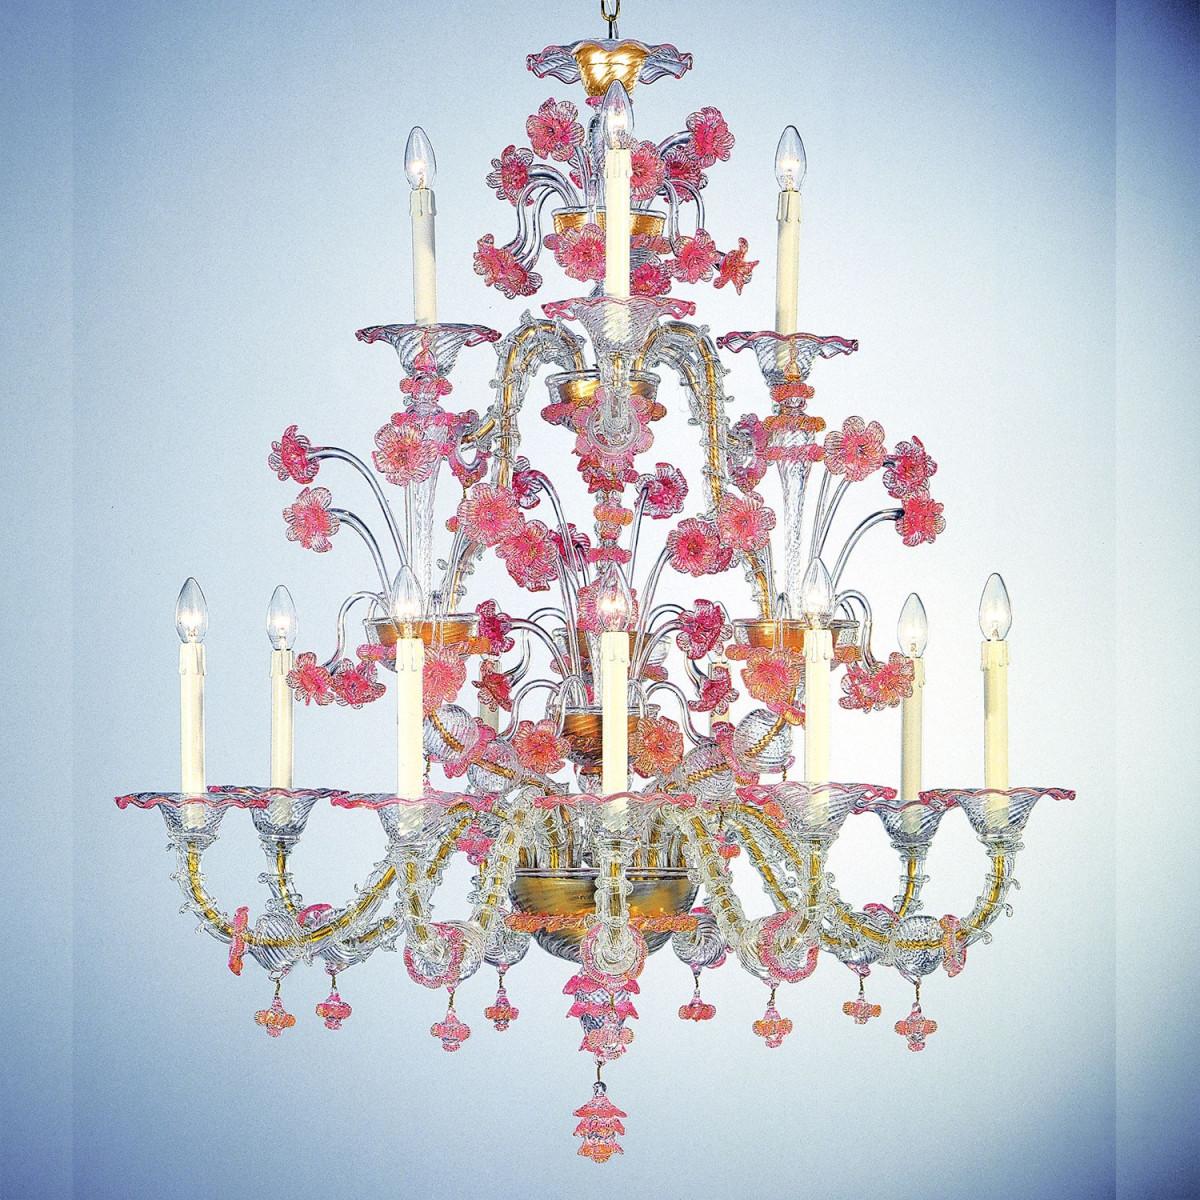 """Cloris"" Murano Kronleuchter - 12 flammig - transparent rosa"